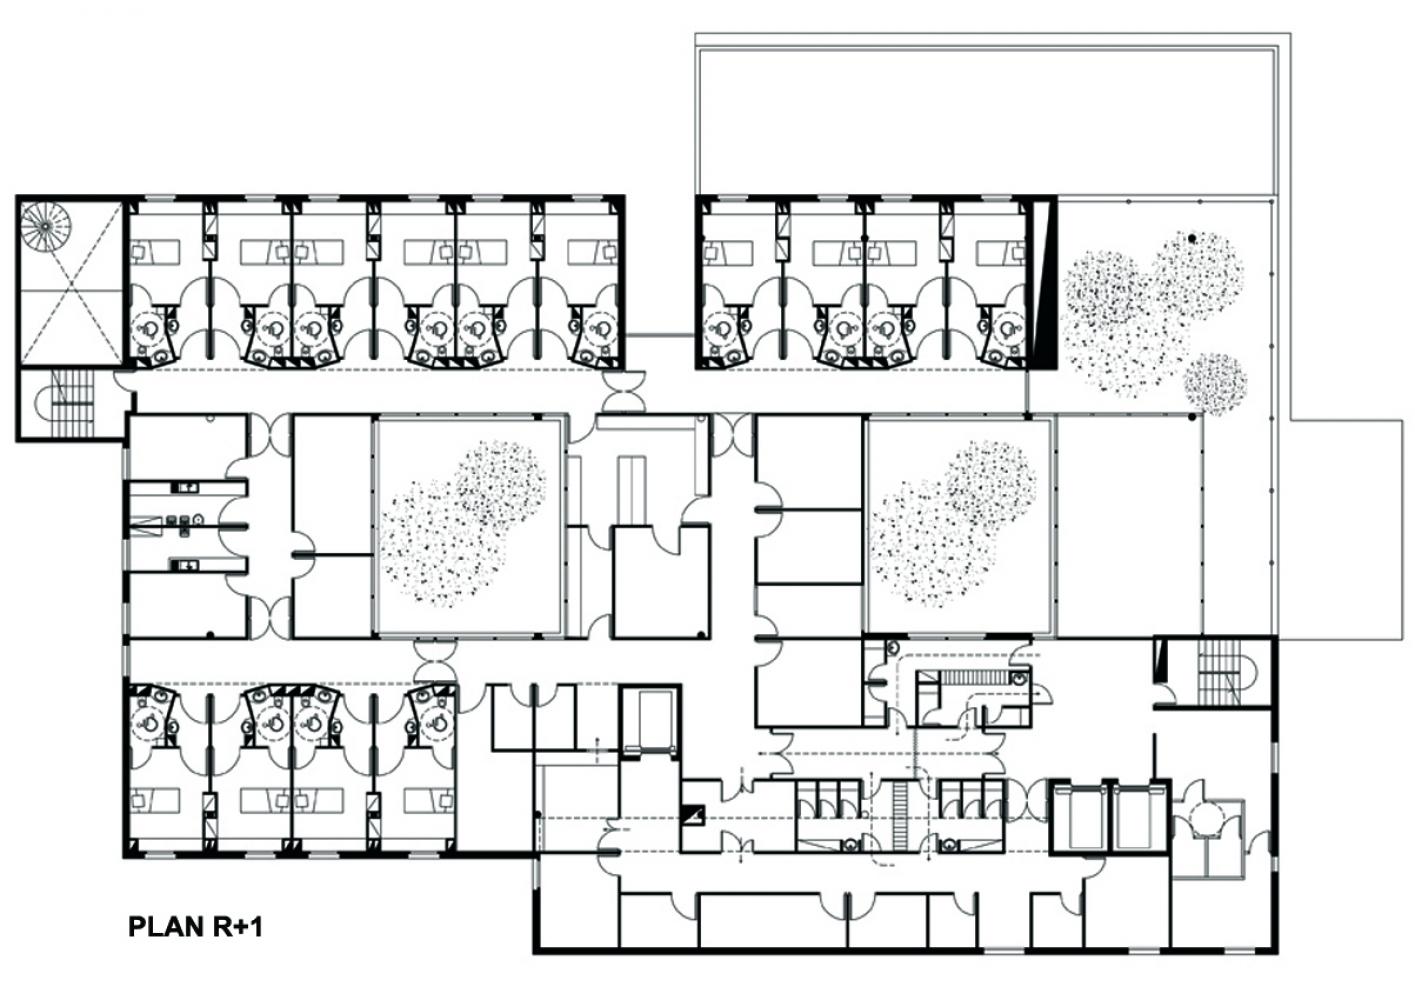 zchr--03 Pascale SEURIN Architecte - Pascale SEURIN Architecte